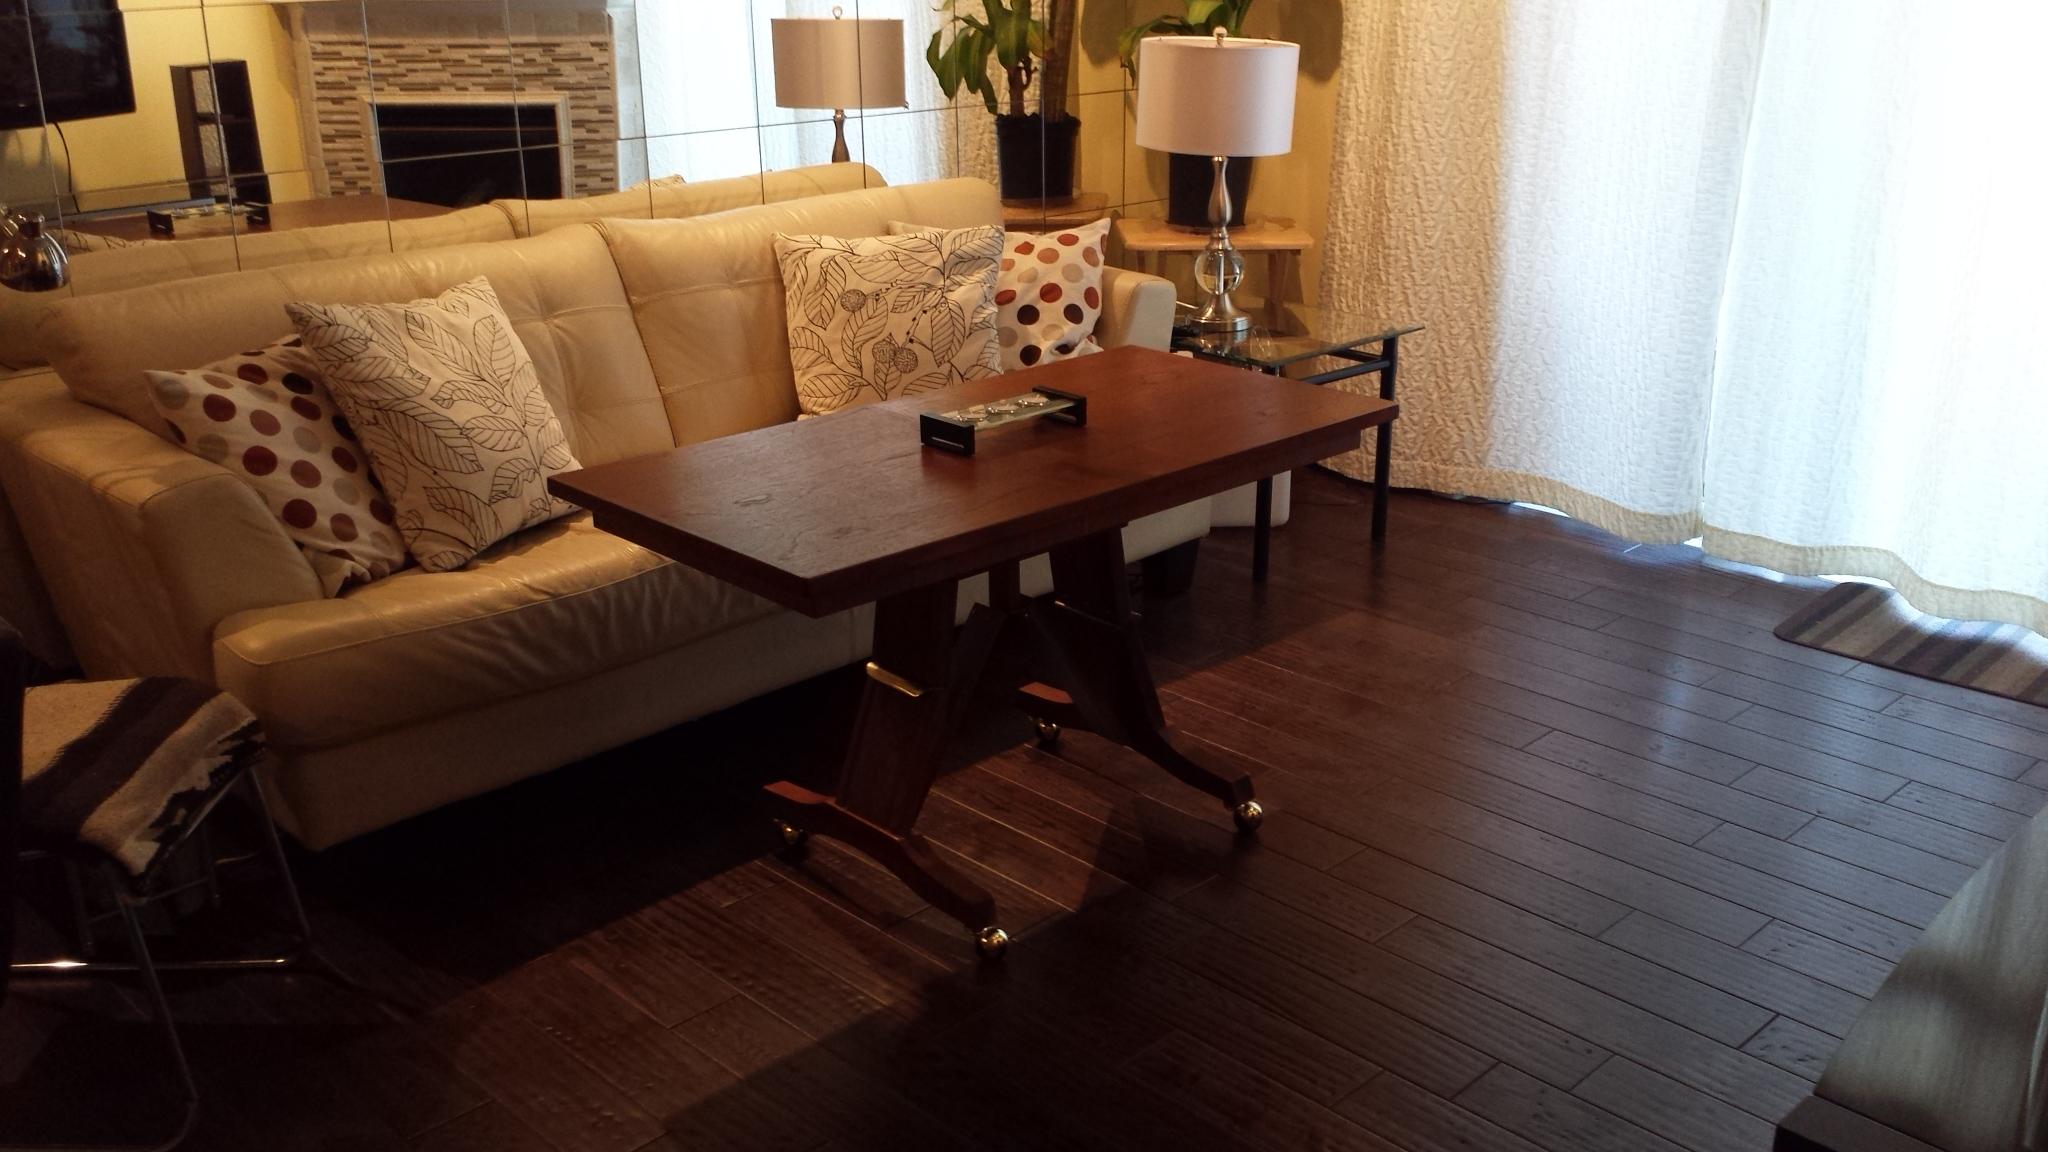 Unit 204 Living Room 5